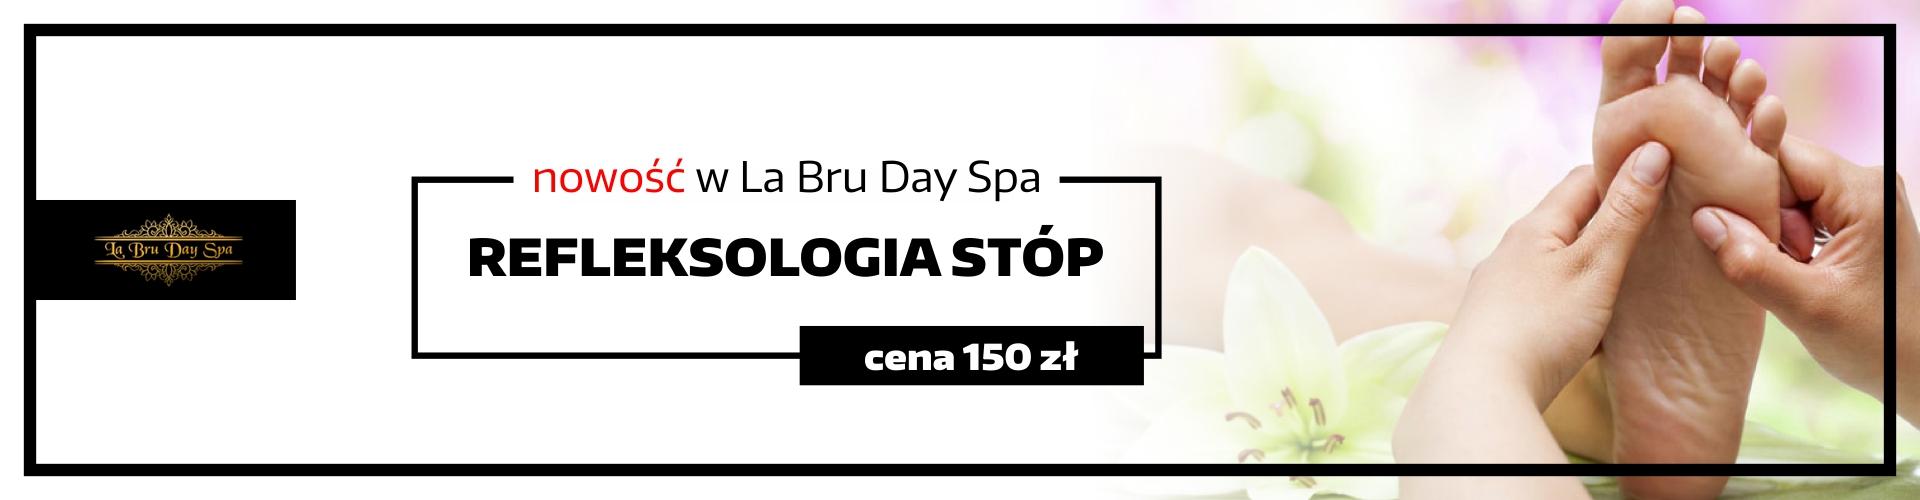 refleksologia_spa